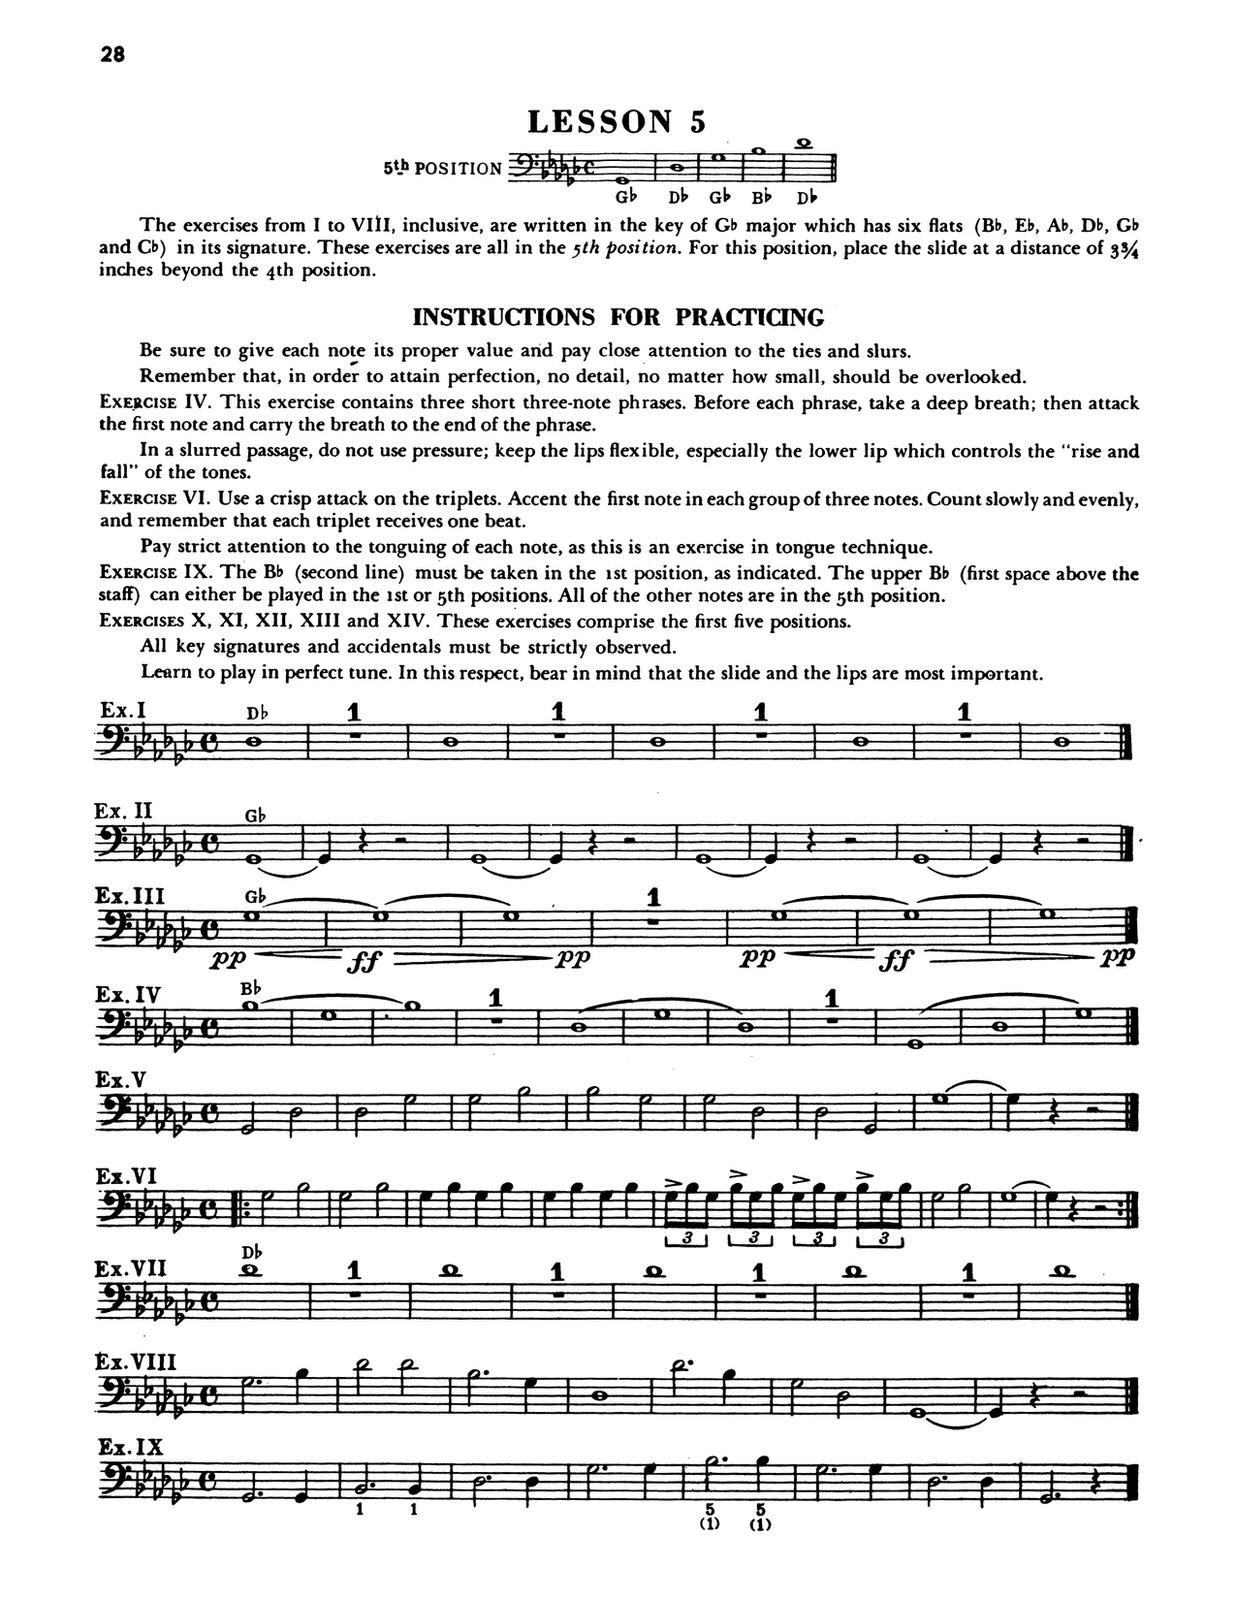 Clean Dorsey, The Modern Trombonist 5